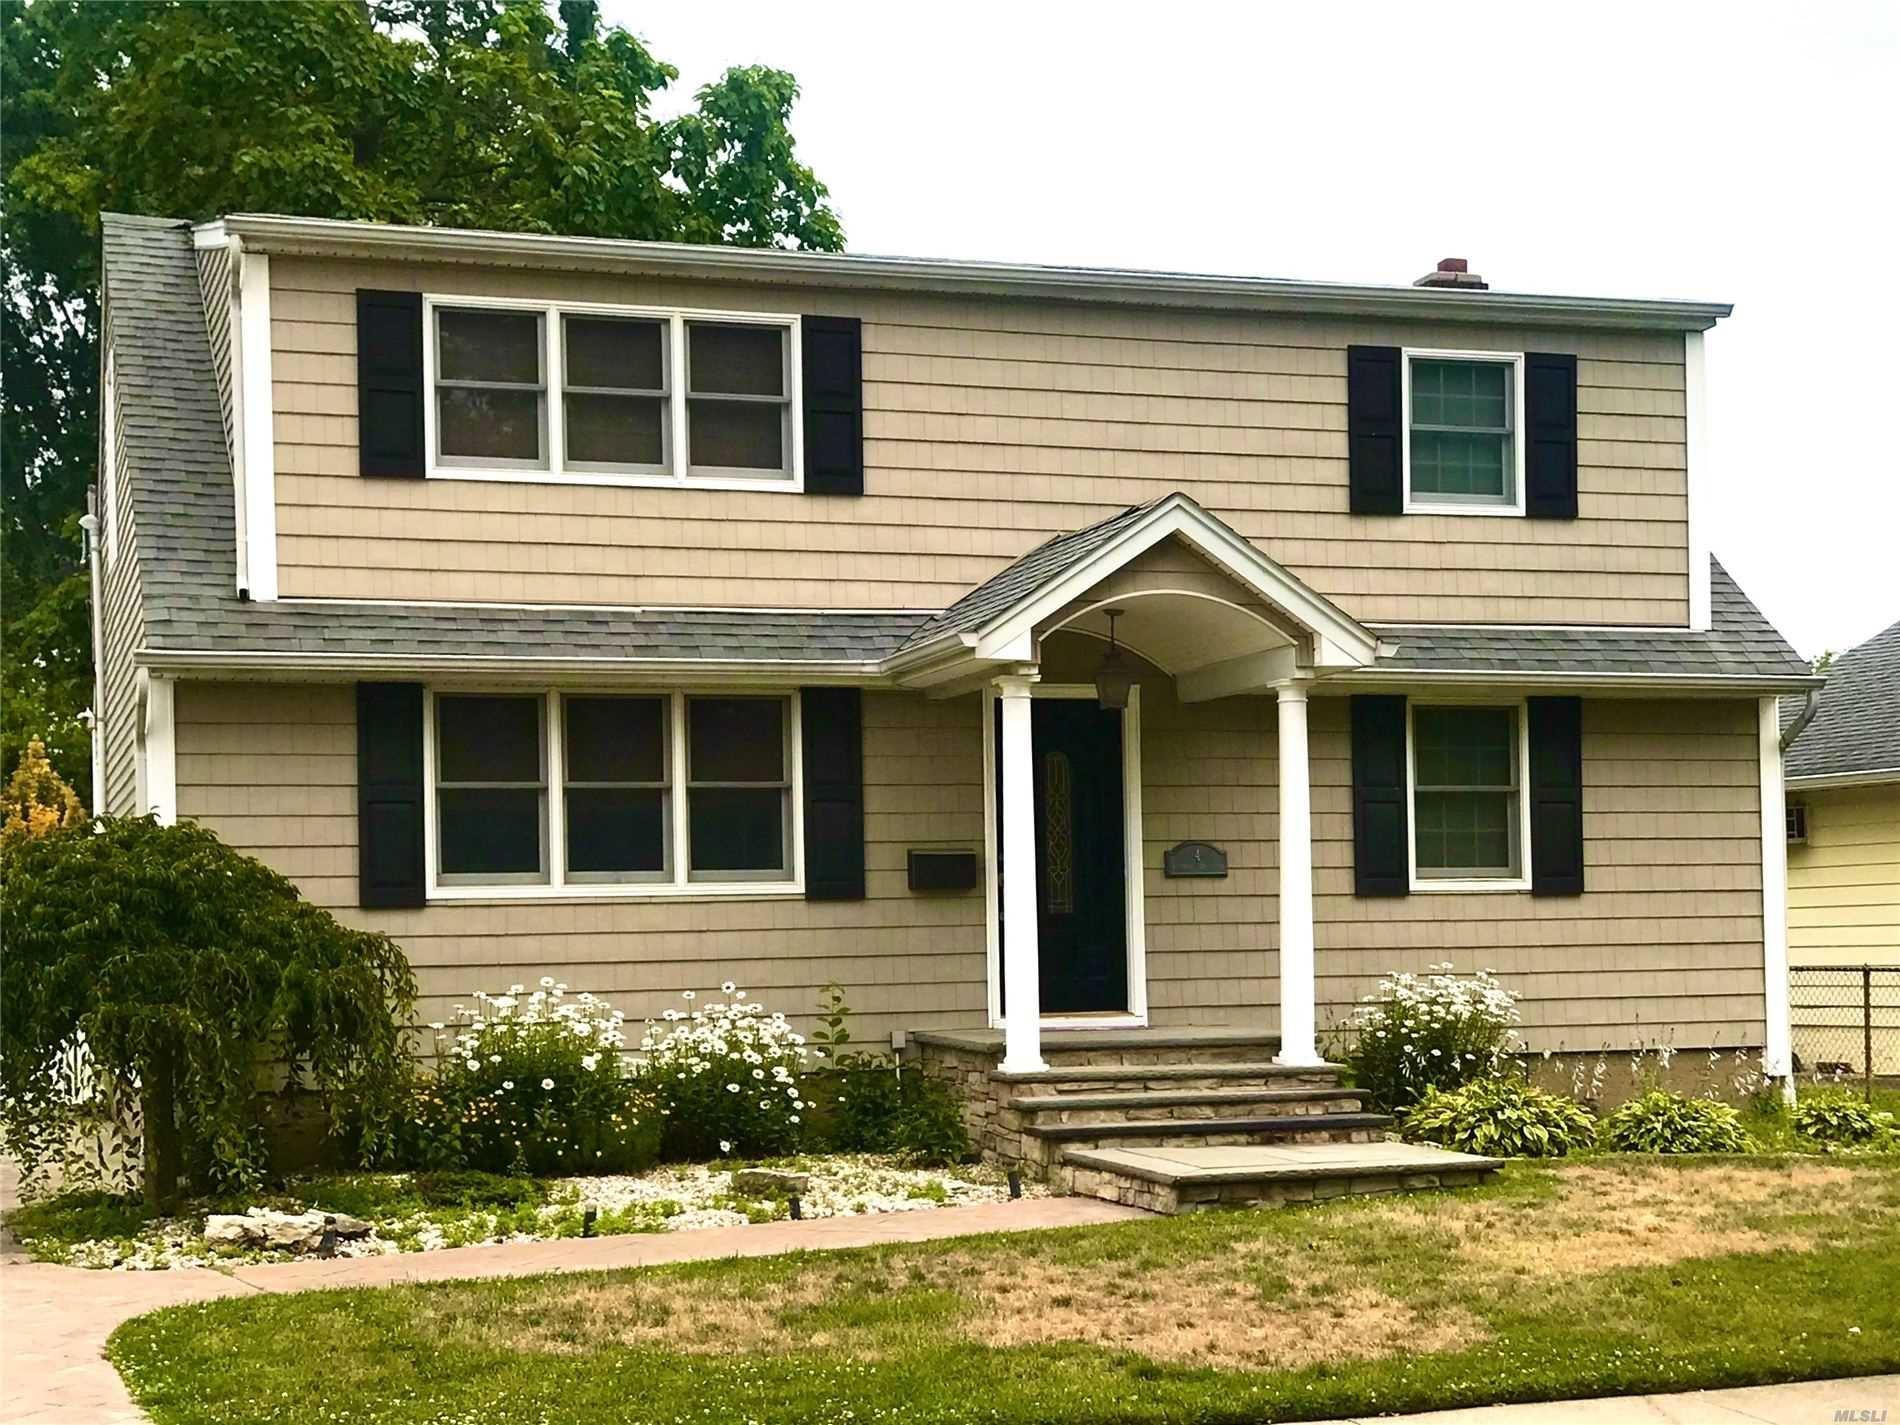 4 Woodbine Drive S, Hicksville, NY 11801 - MLS#: 3228252